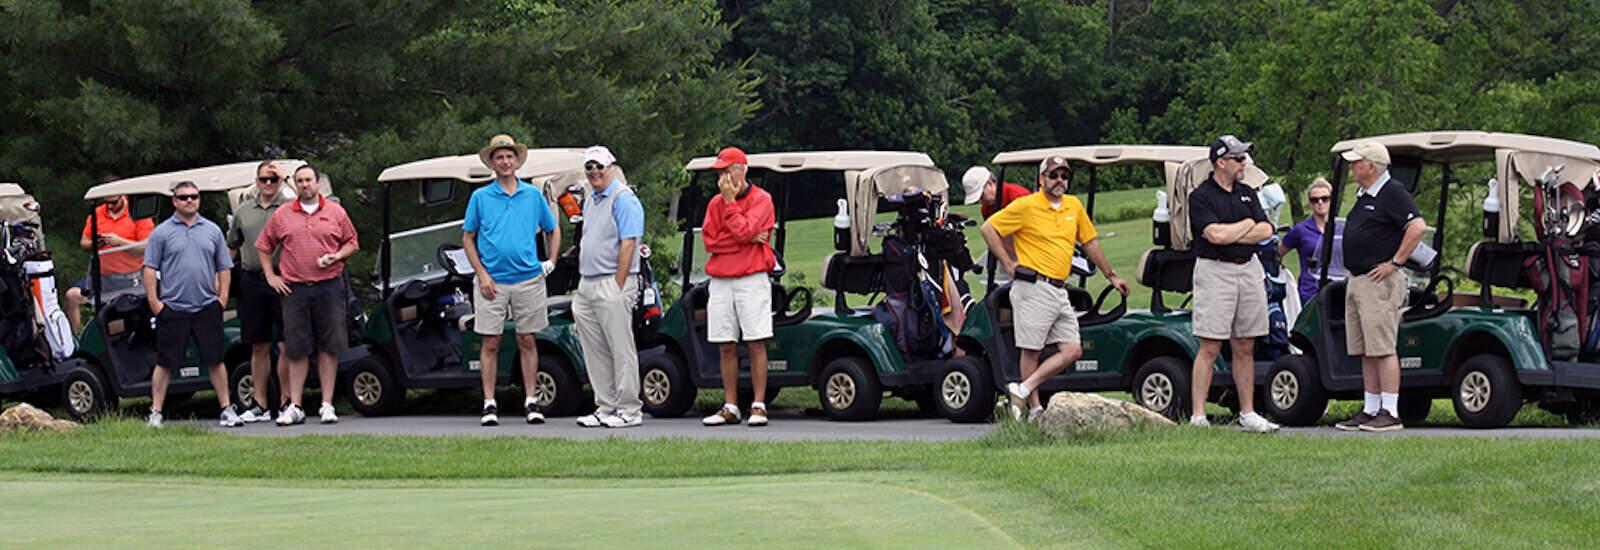 asbury foundation caring class golf tournament